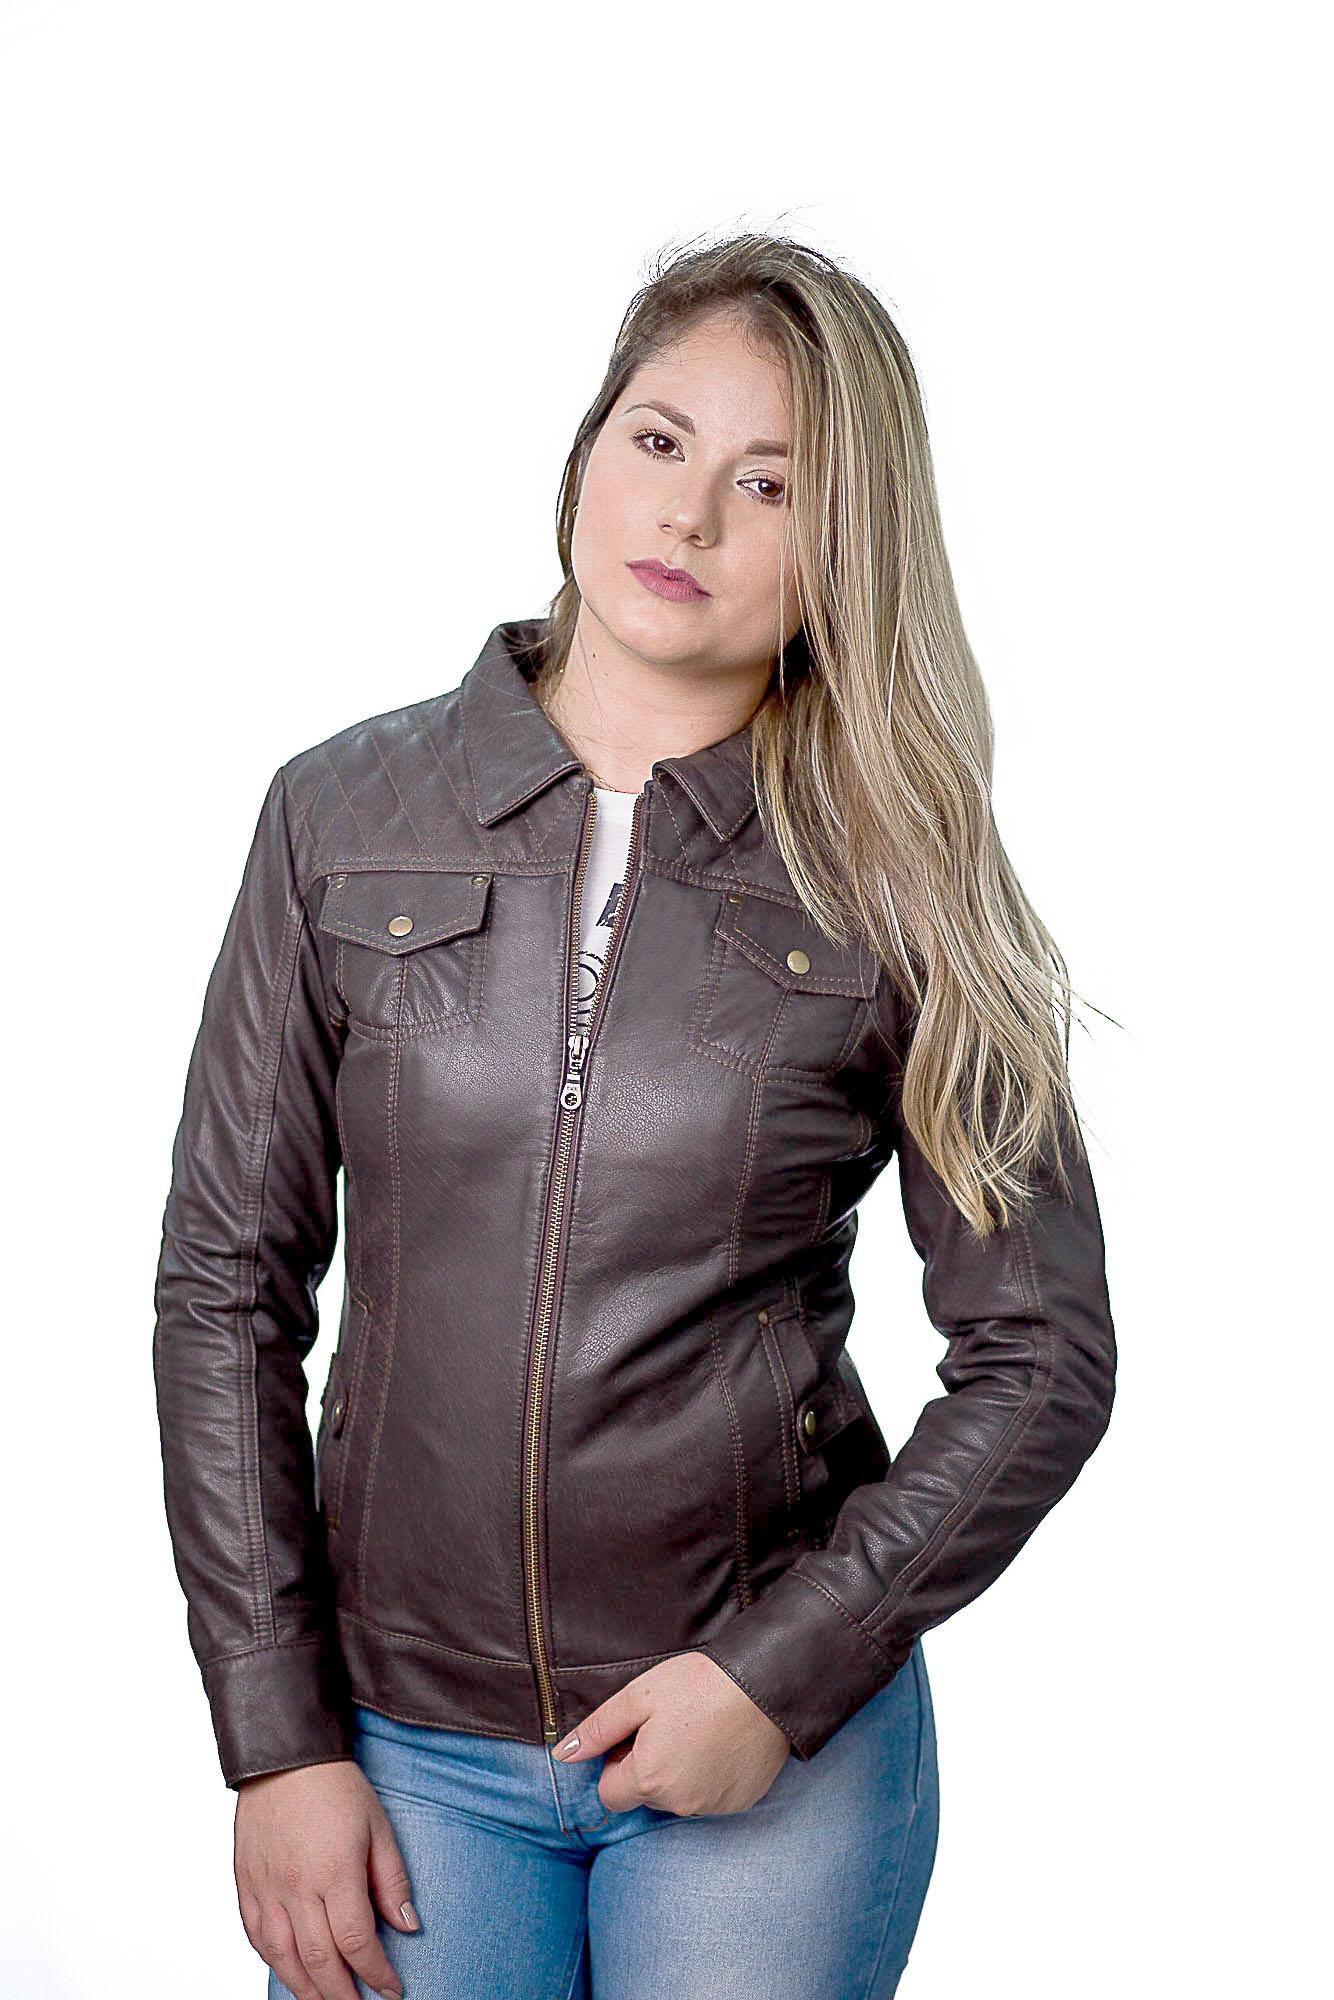 Jaqueta Feminina 187 Ranger Brown